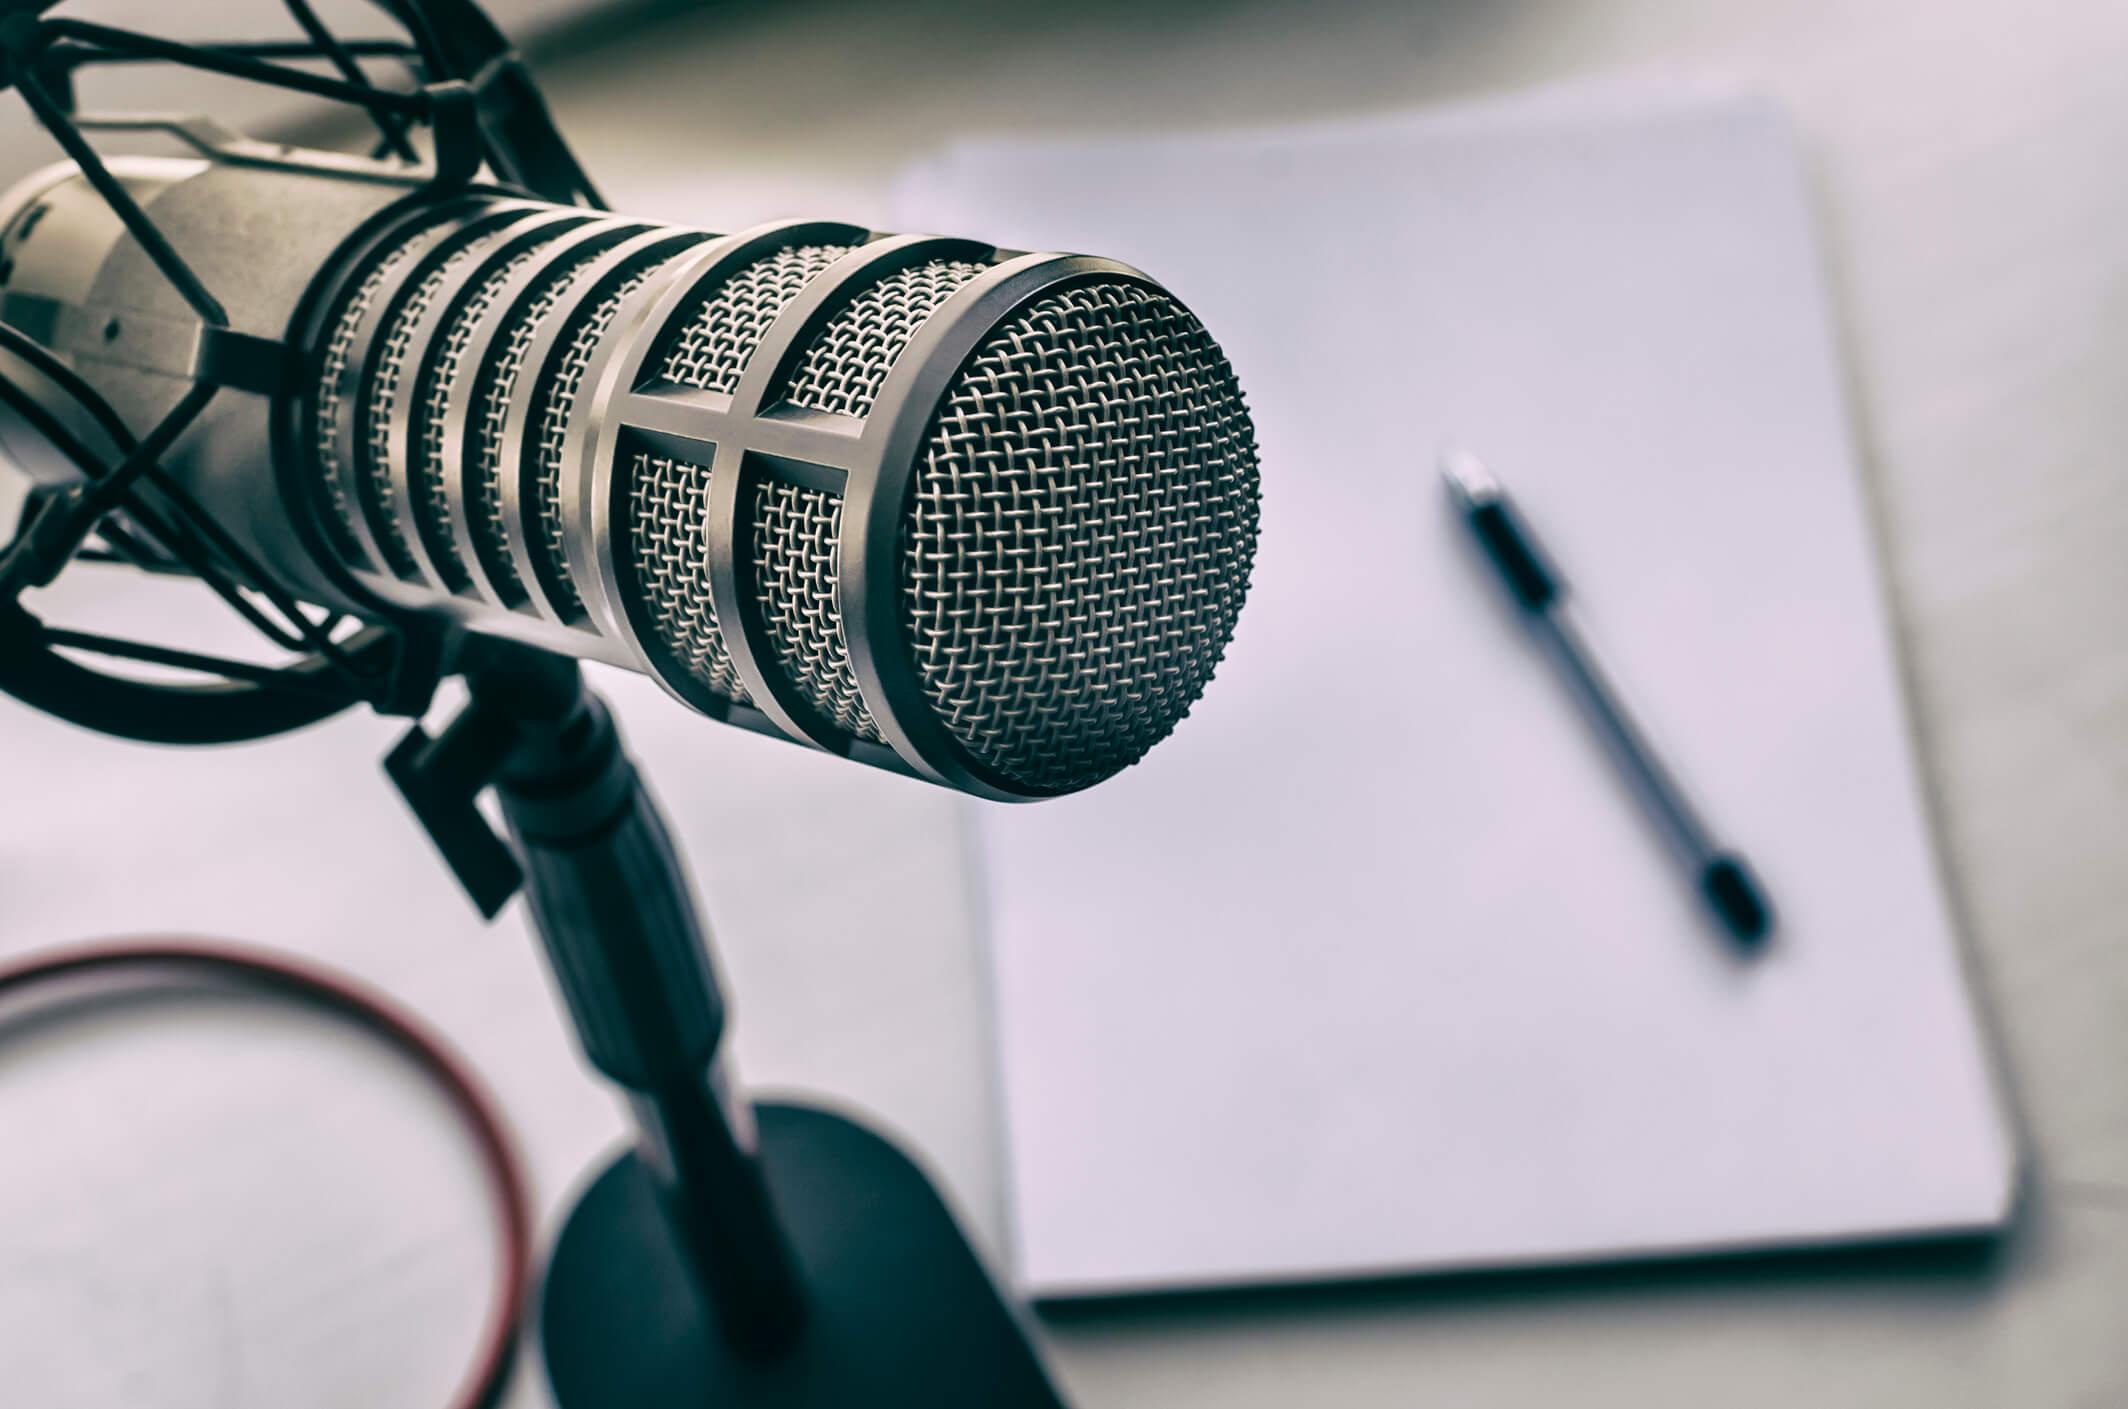 Podcastmikrofon